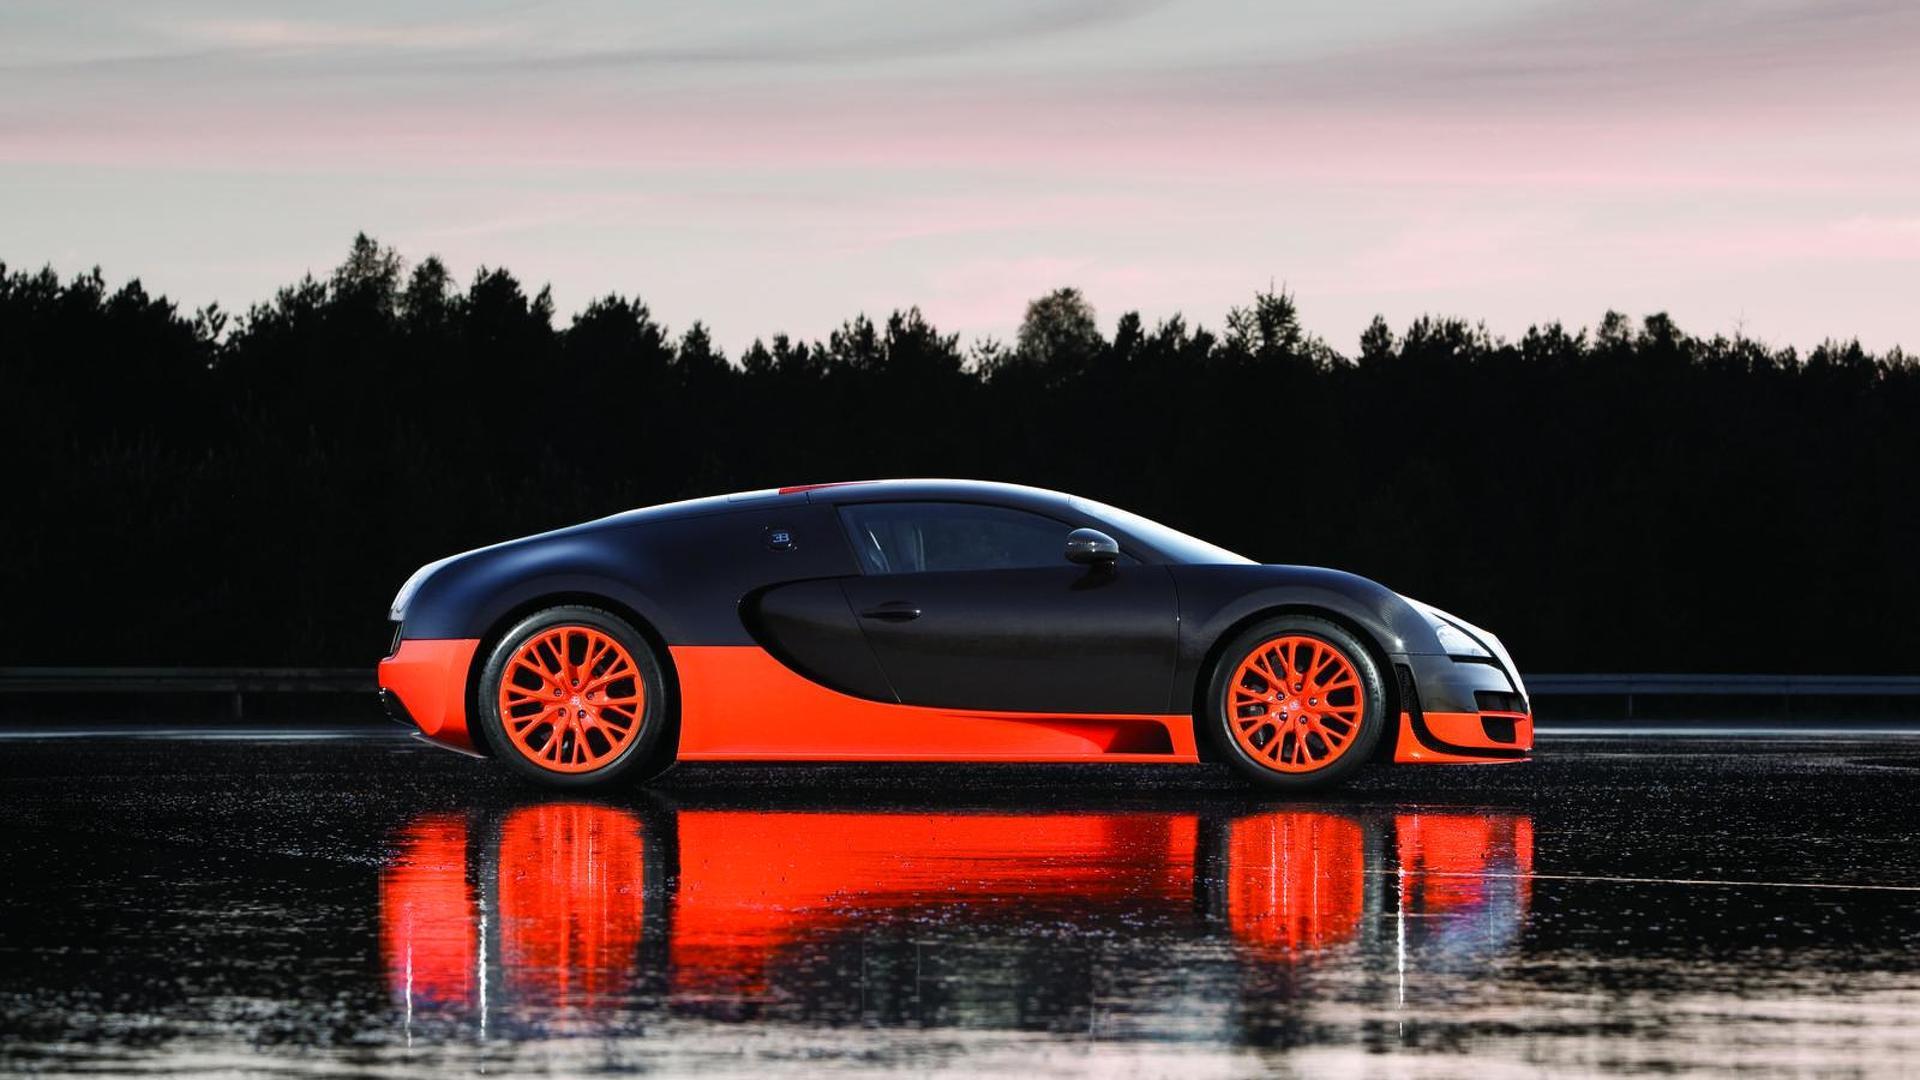 Bugatti Veyron Super Sport Price >> Bugatti Veyron 16 4 Super Sport Revealed Sets 268 Mph Land